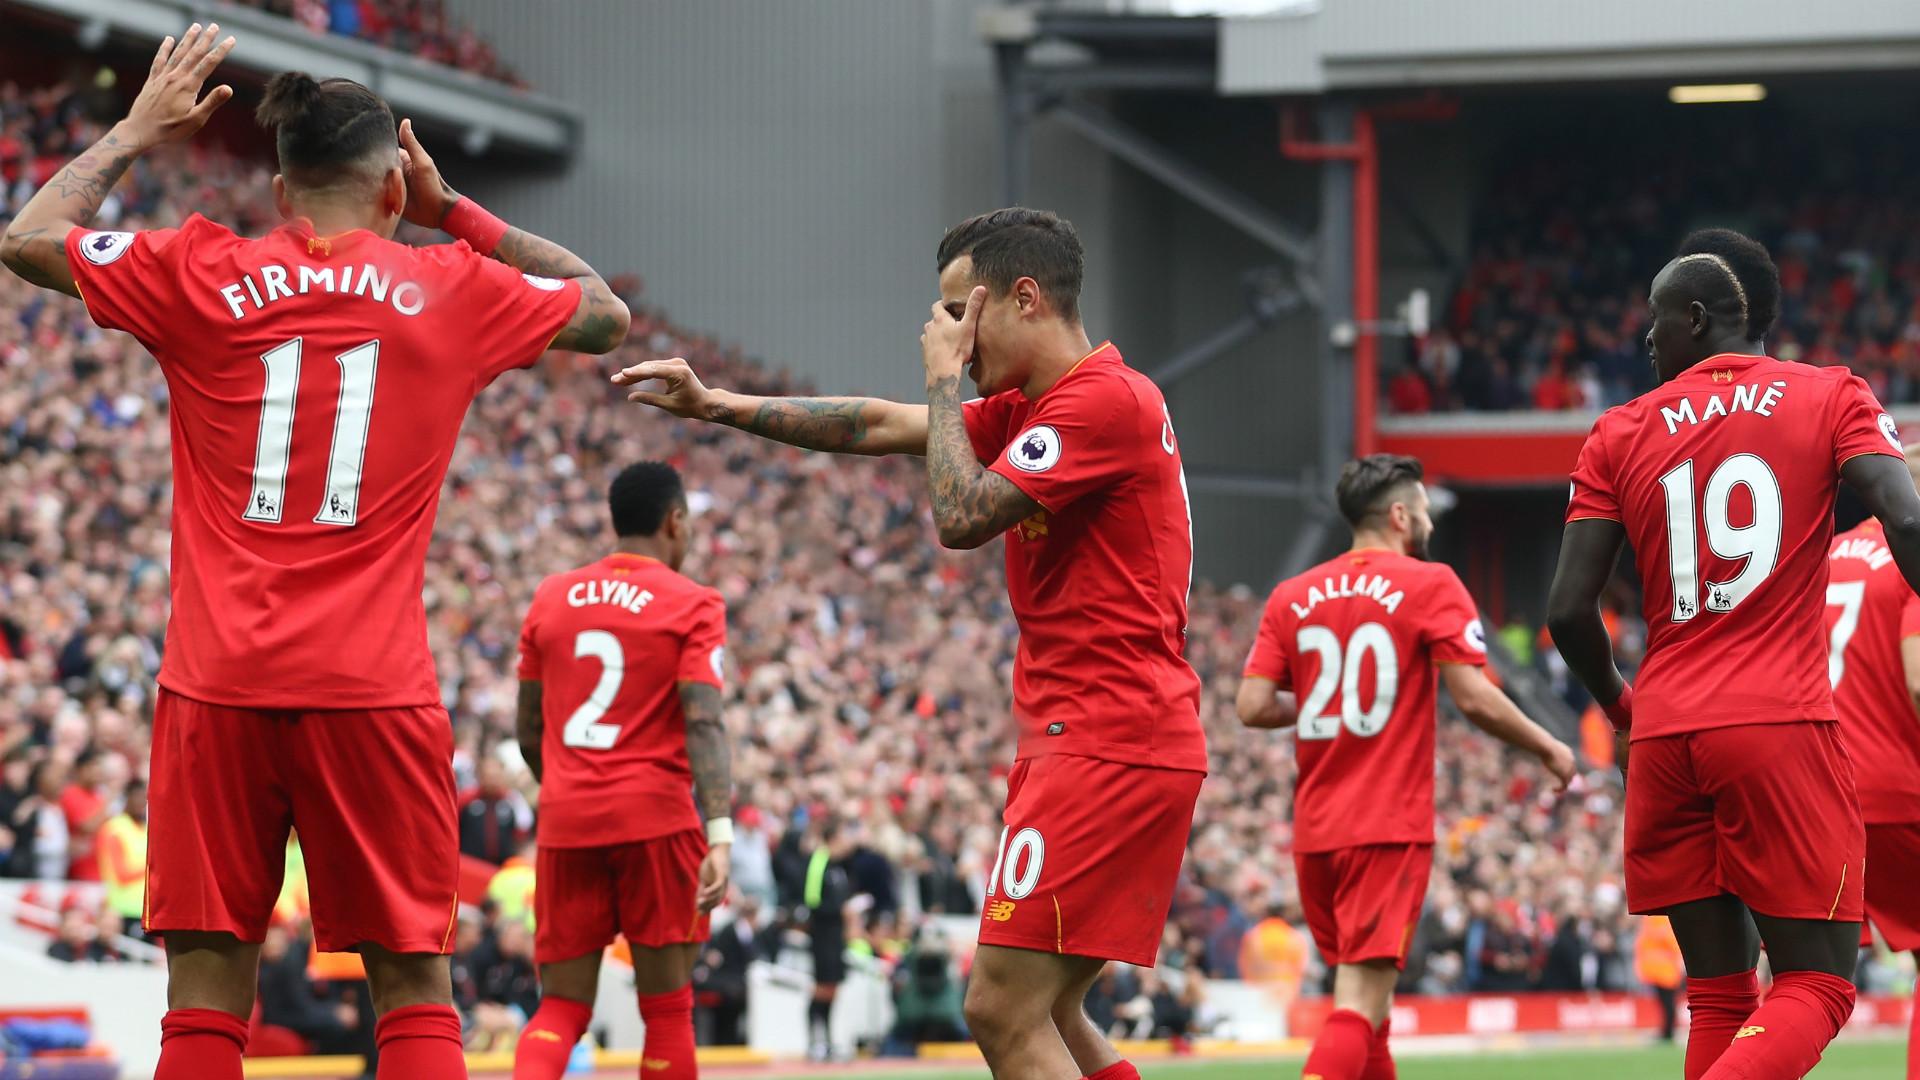 HD Liverpool Firmino Coutinho Lallana Mane